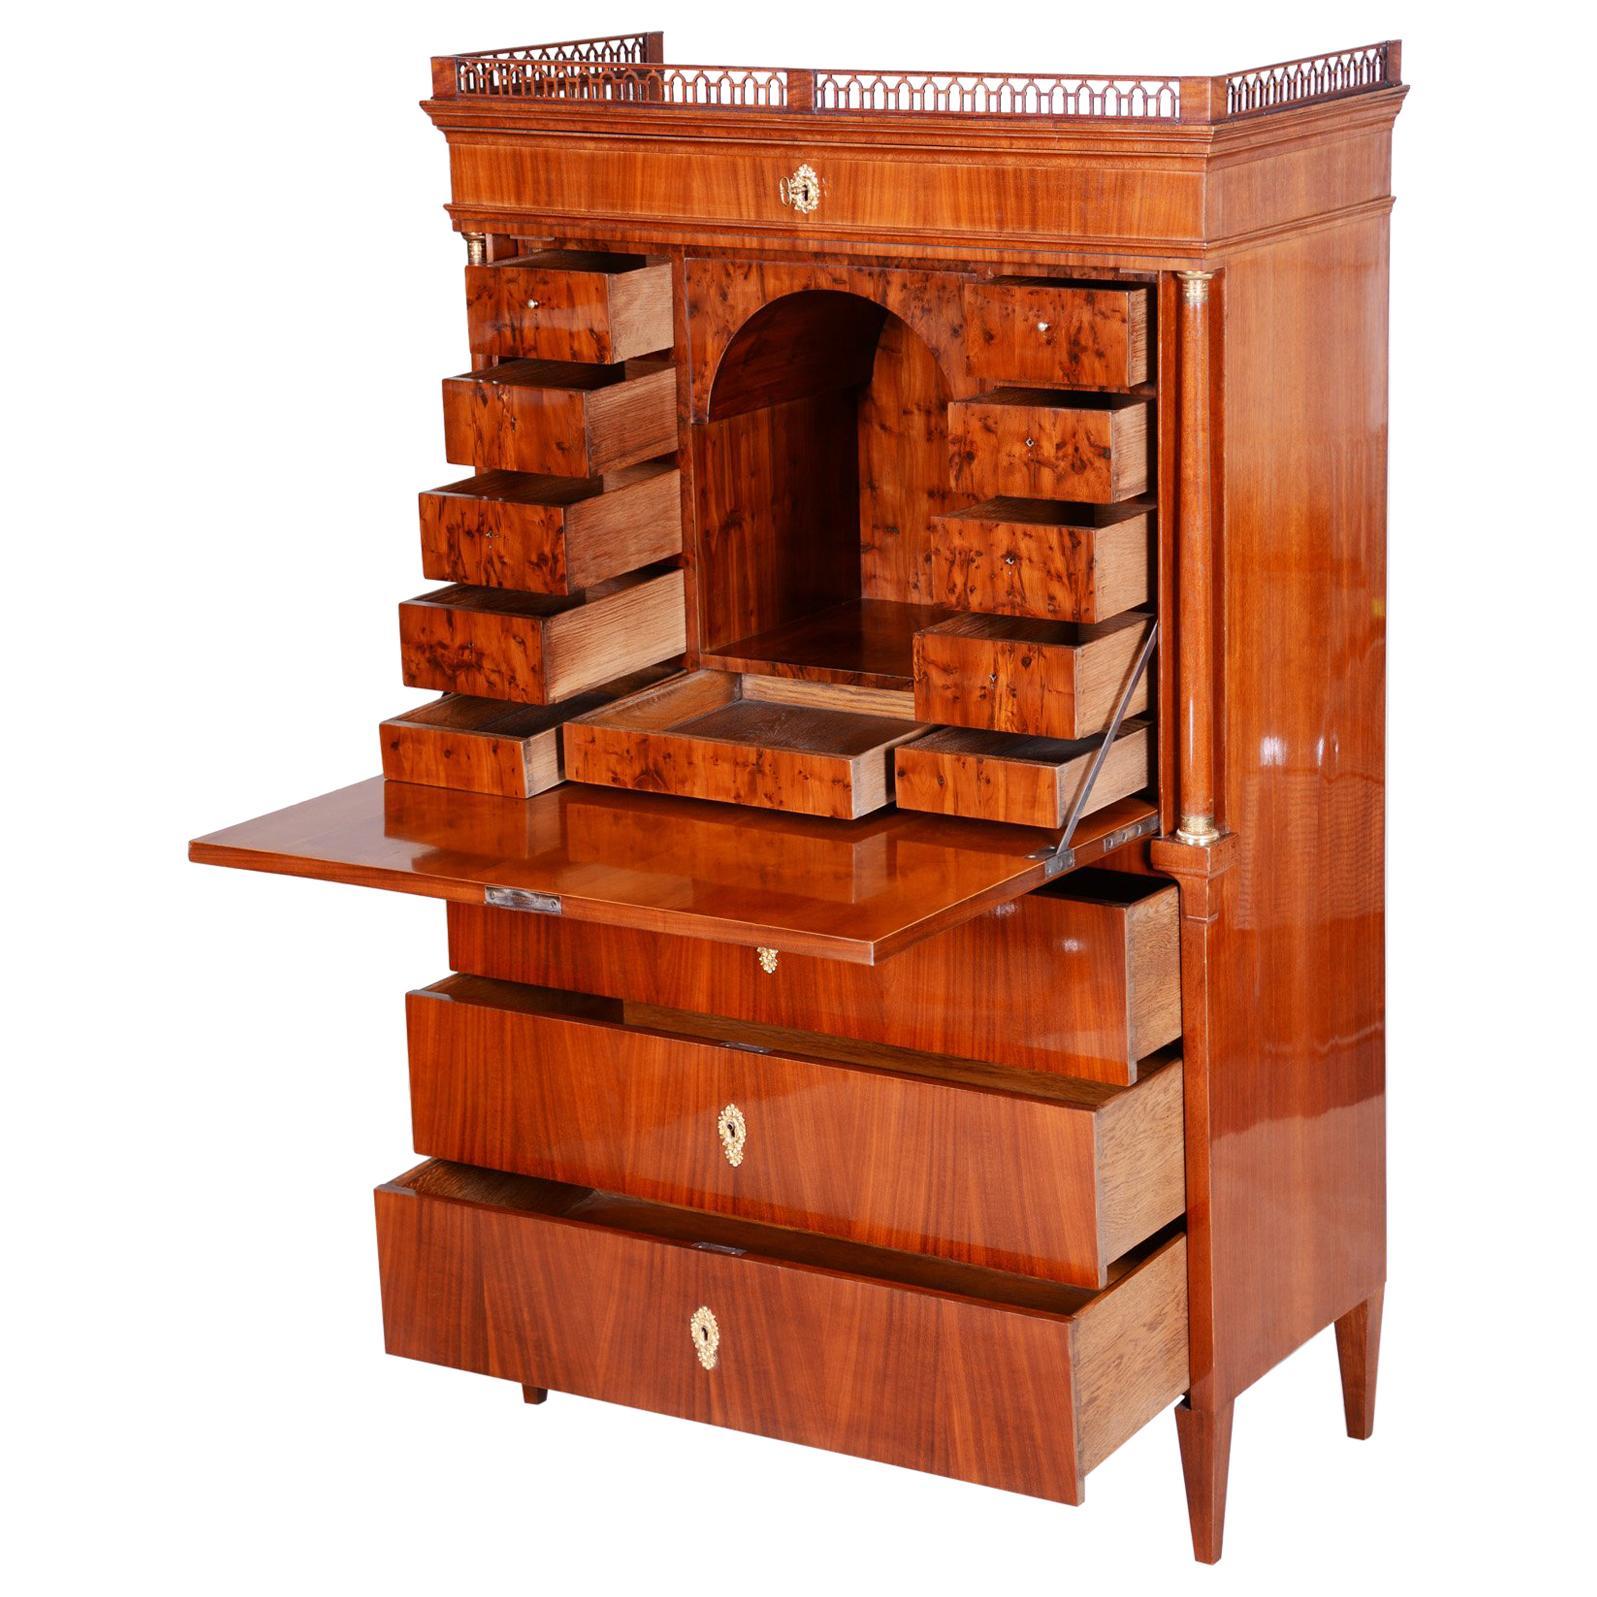 Unique Austrian Empire Secretary/Writing Desk, Material Mahogany, Wien 1820-1829